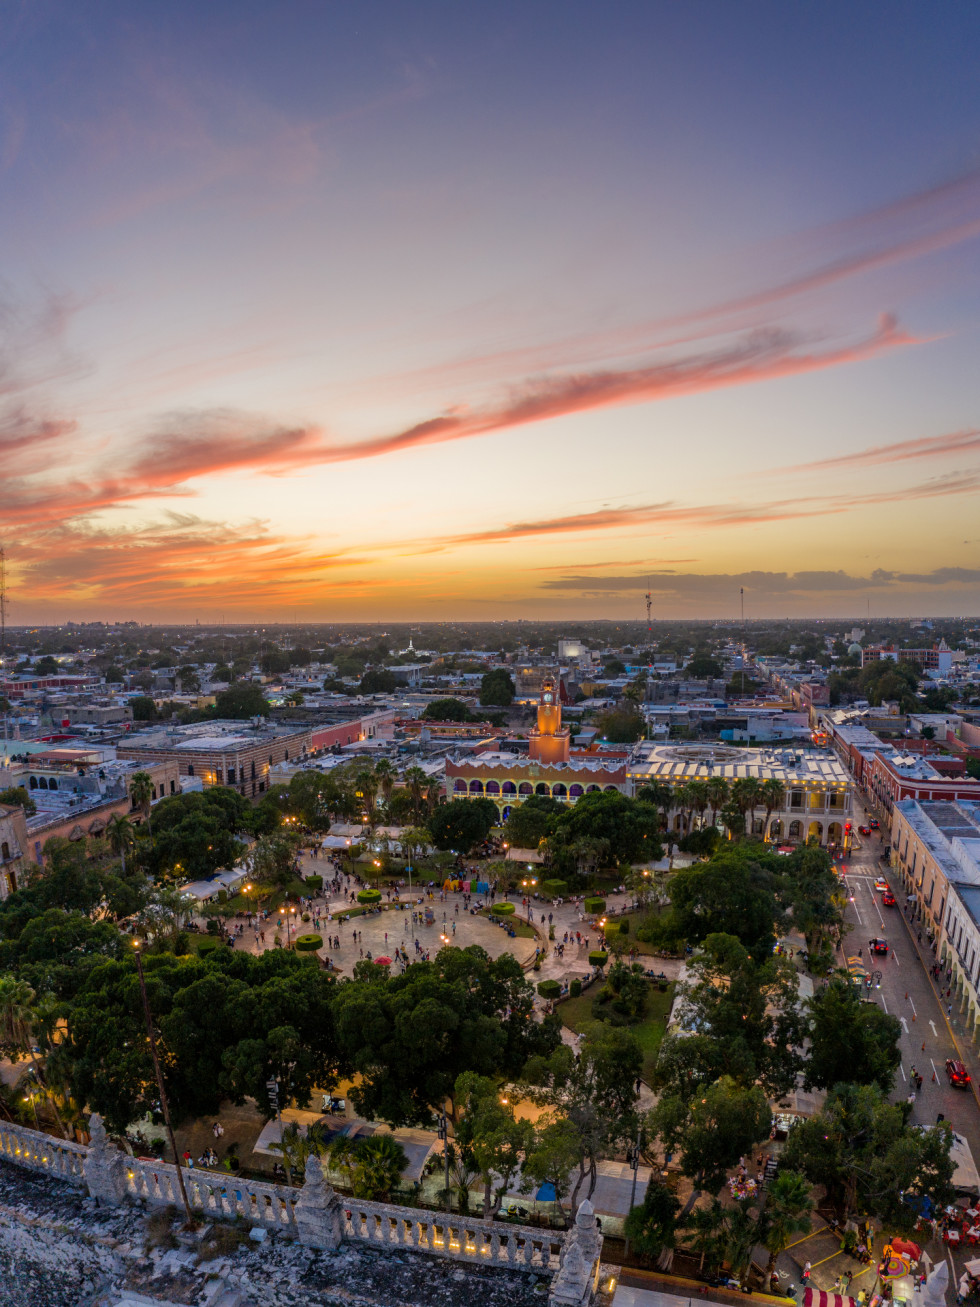 United to Mérida Yucatán